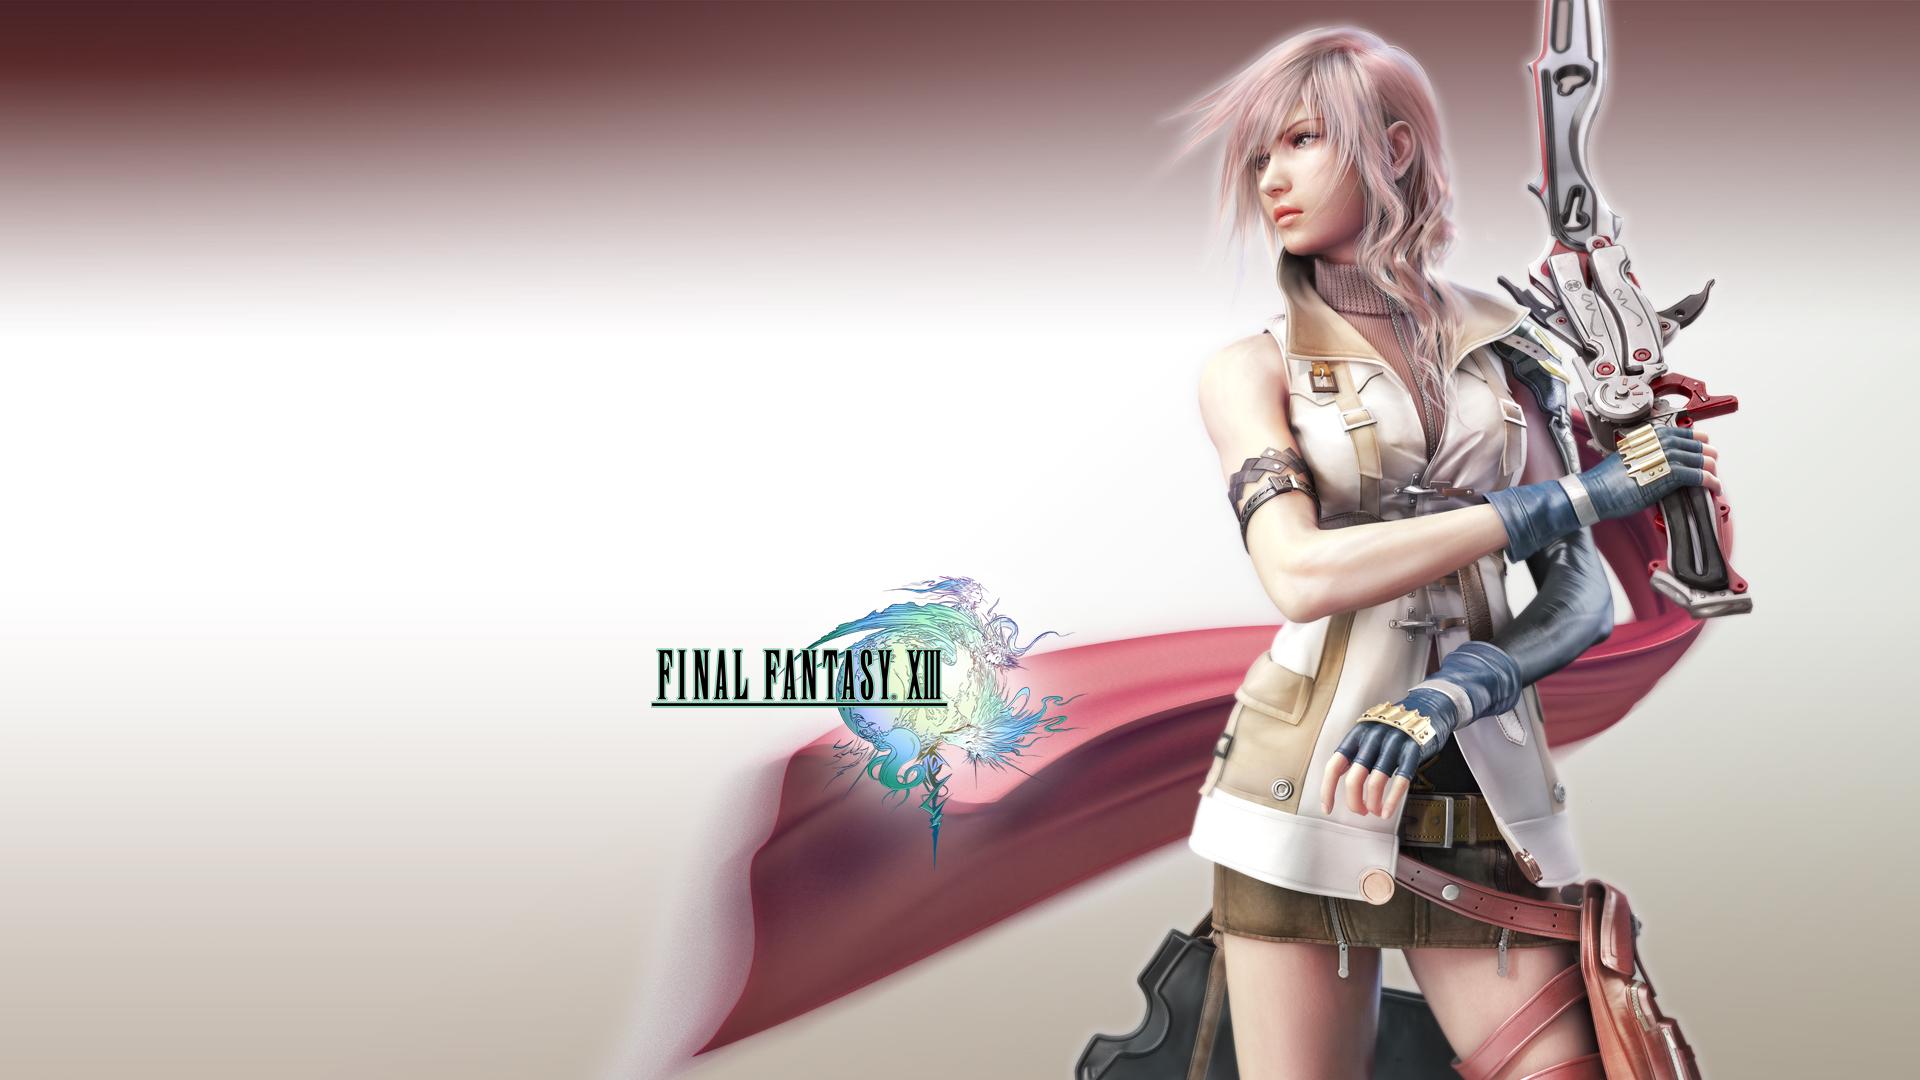 Video Game - Final Fantasy XIII  Wallpaper